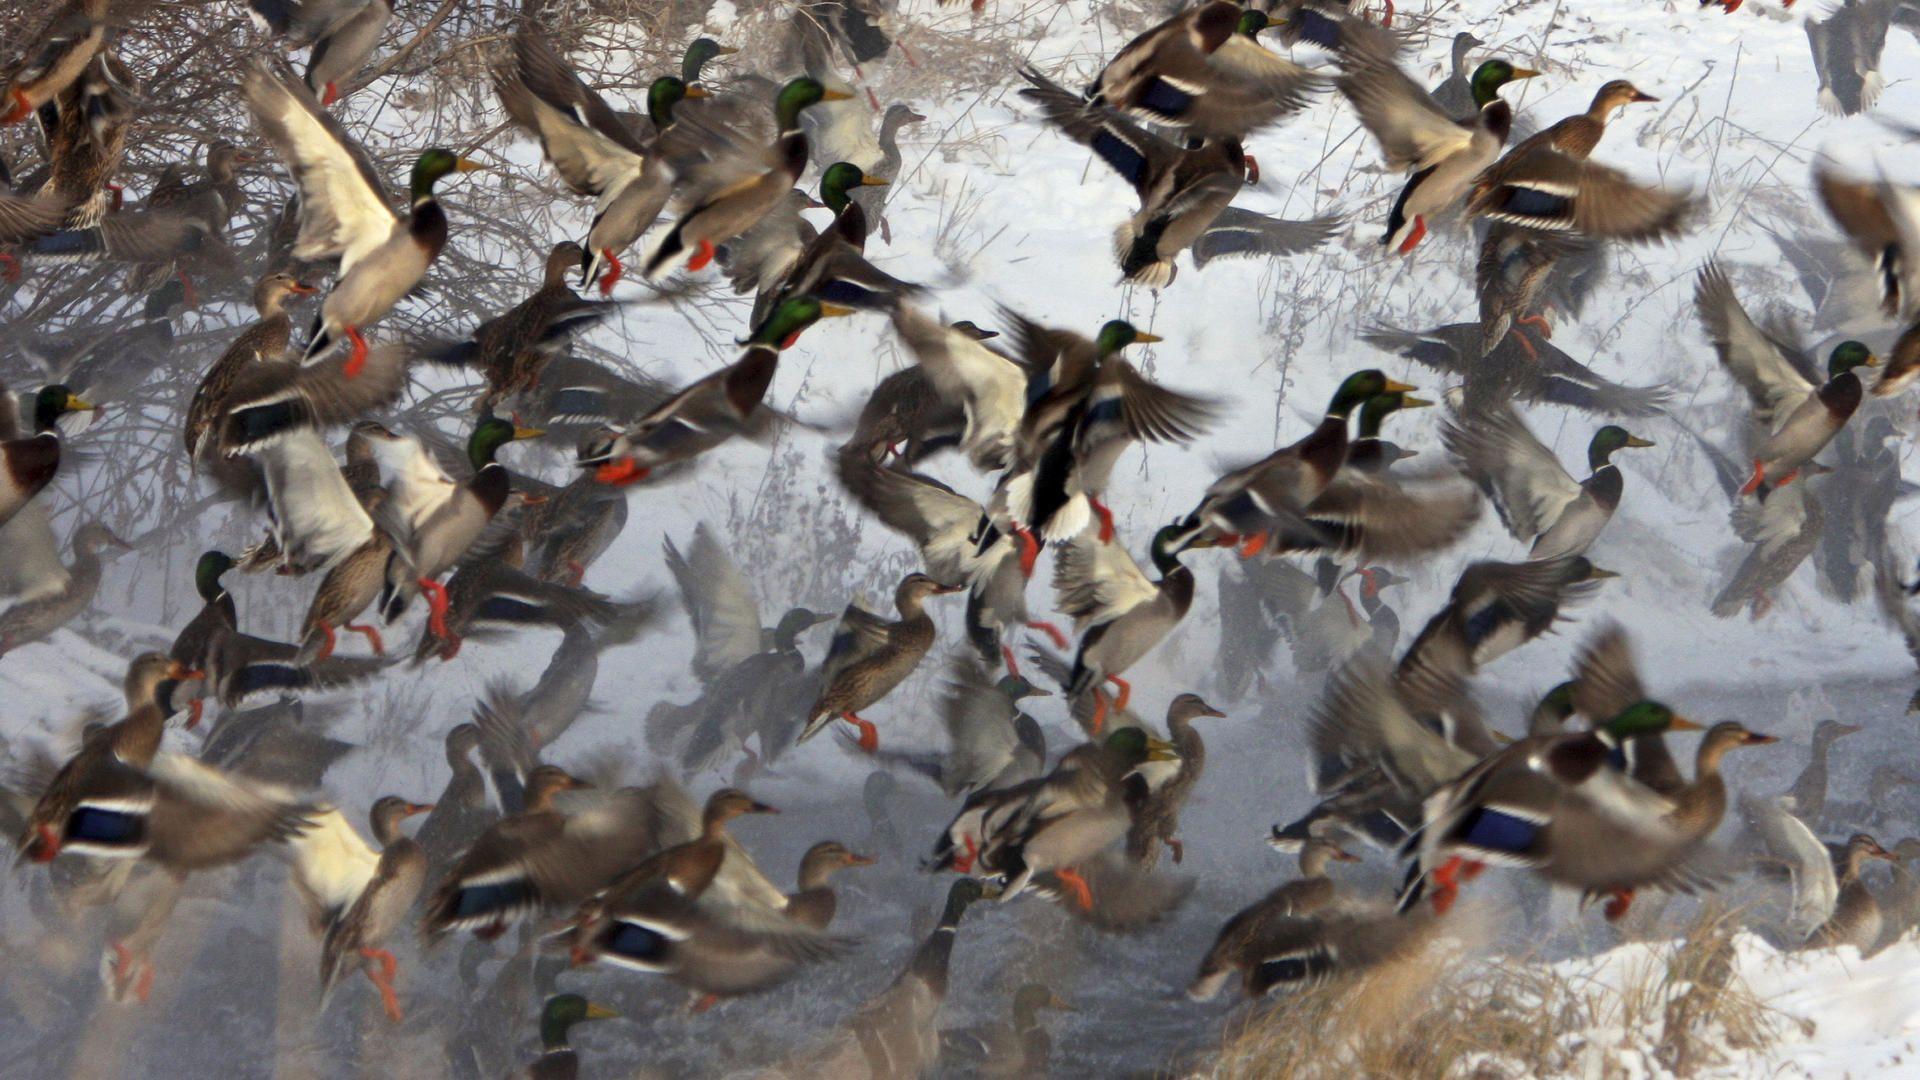 Animals Flock Of Mallards picture nr 40642 1920x1080